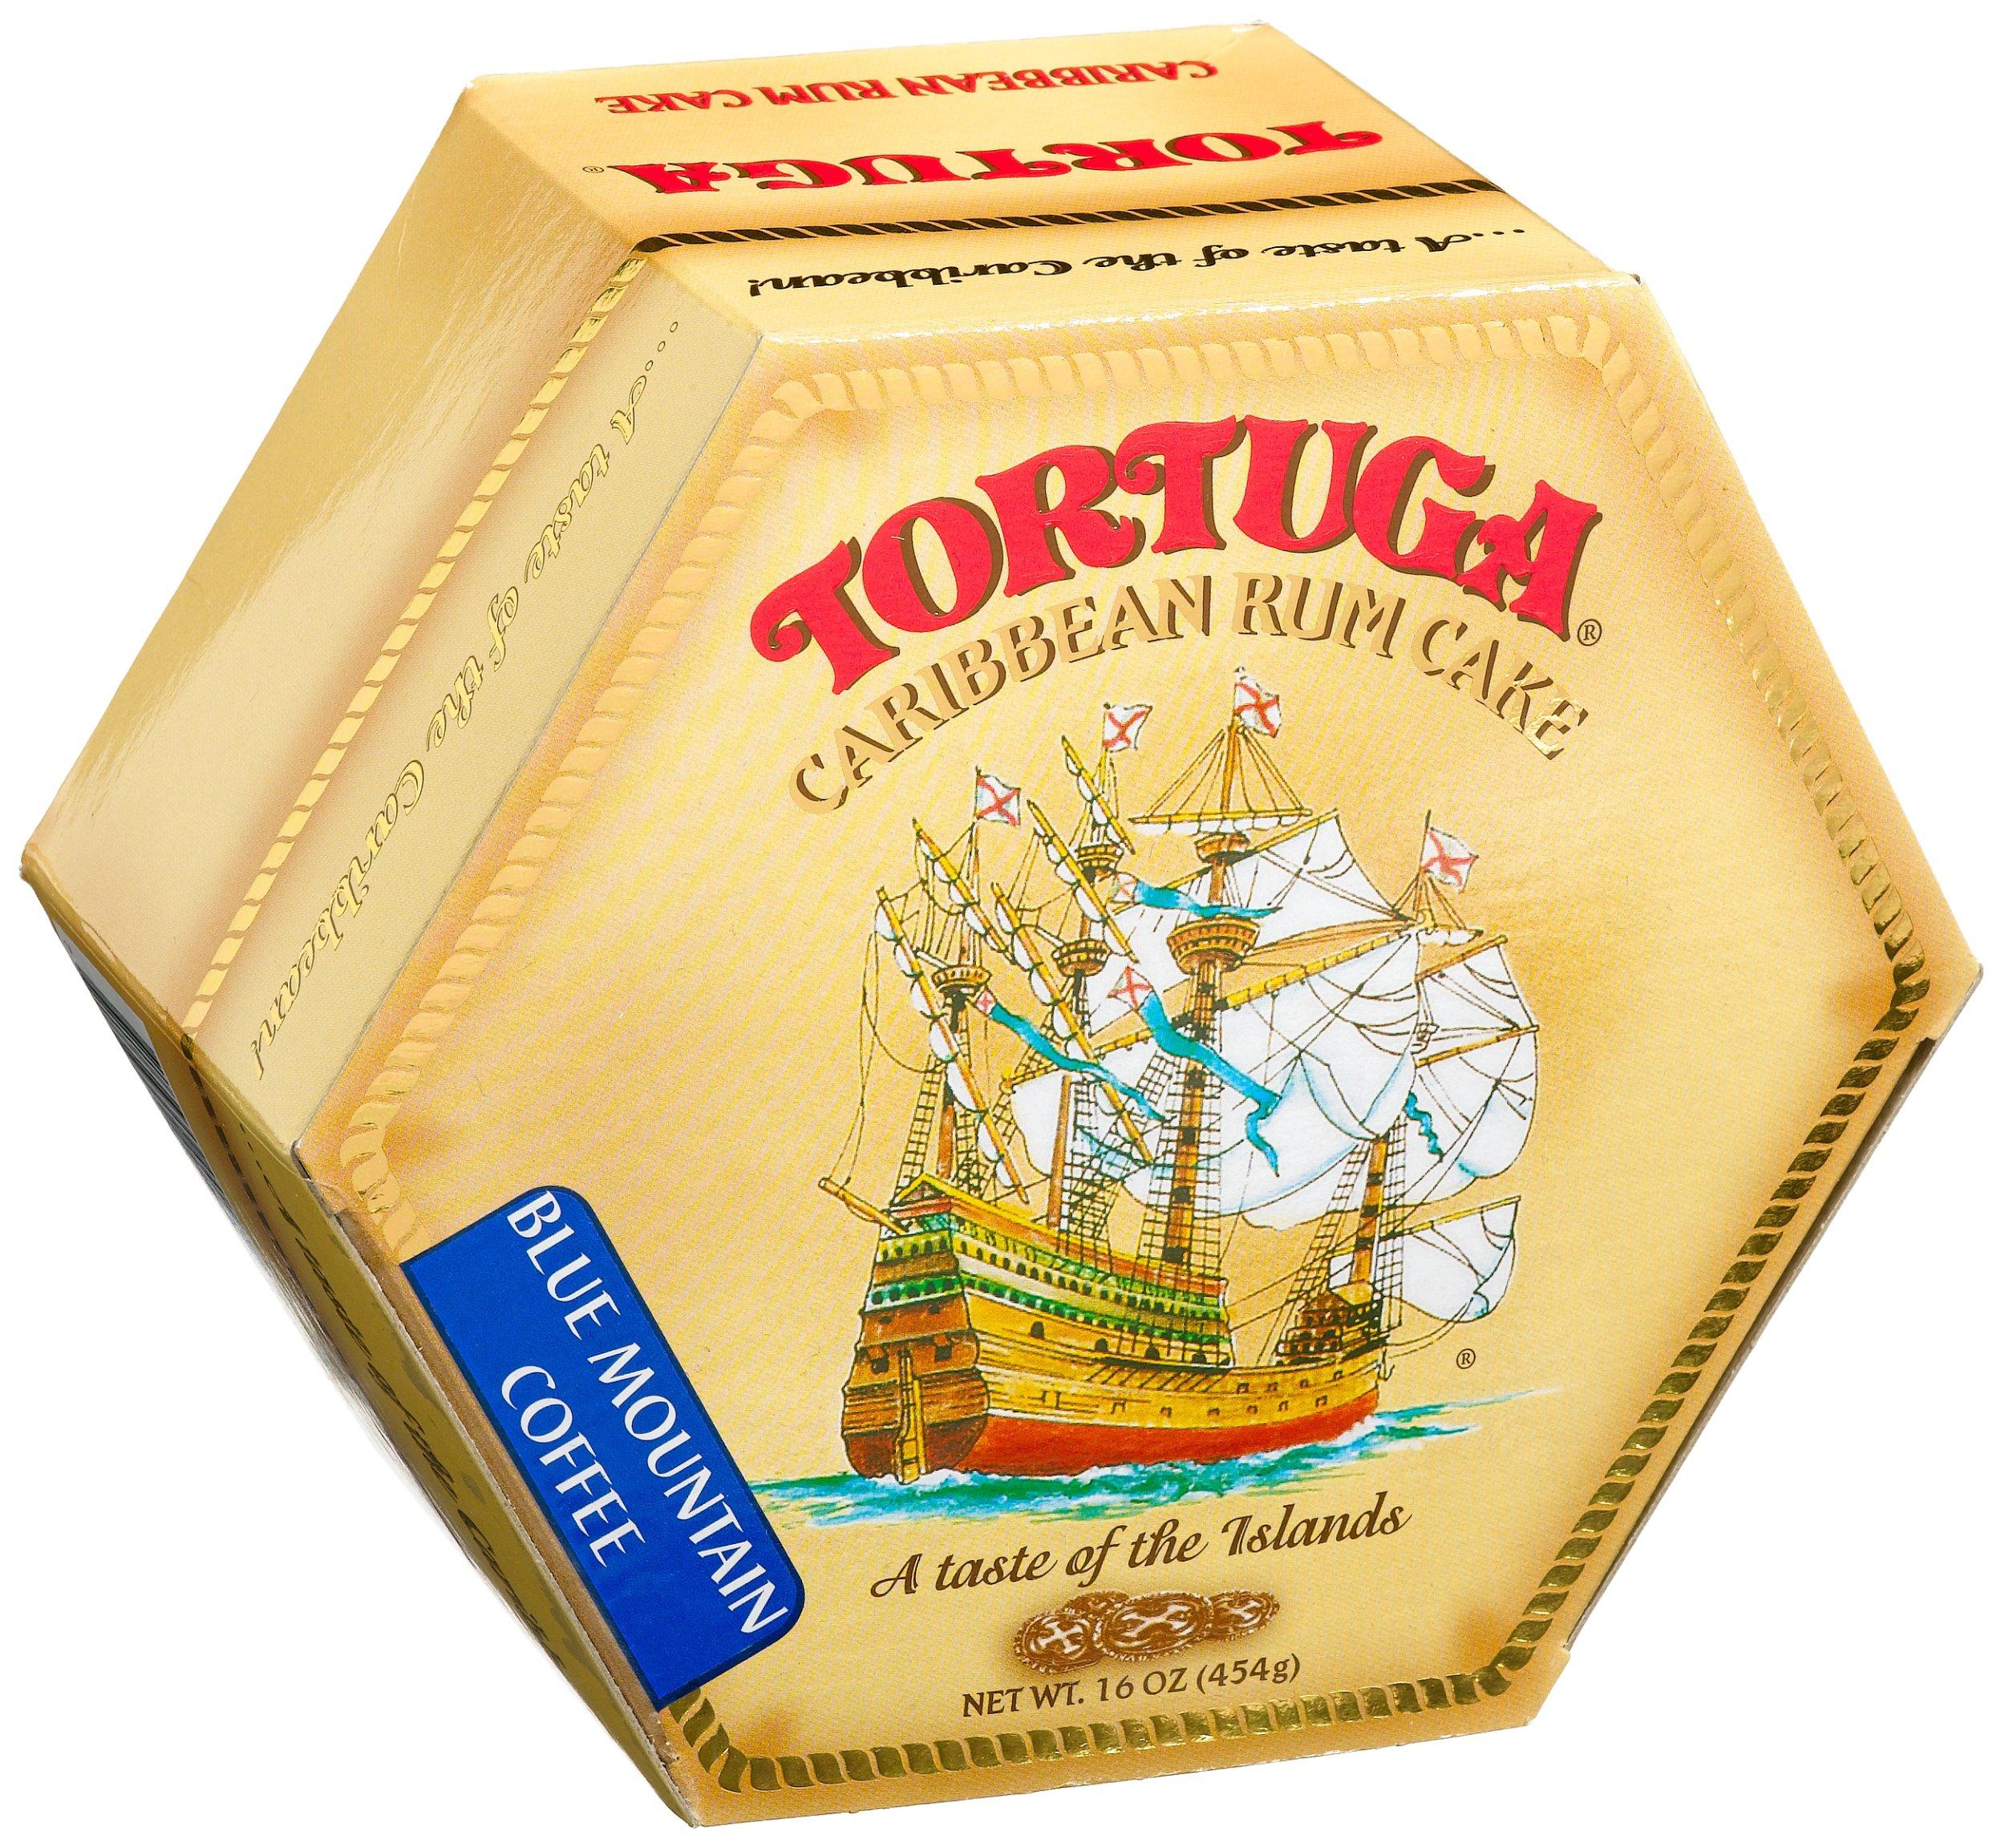 TORTUGA Caribbean Blue Mountain Rum Cake - 16 oz. - The Perfect Premium Gourmet Gift by TORTUGA (Image #2)